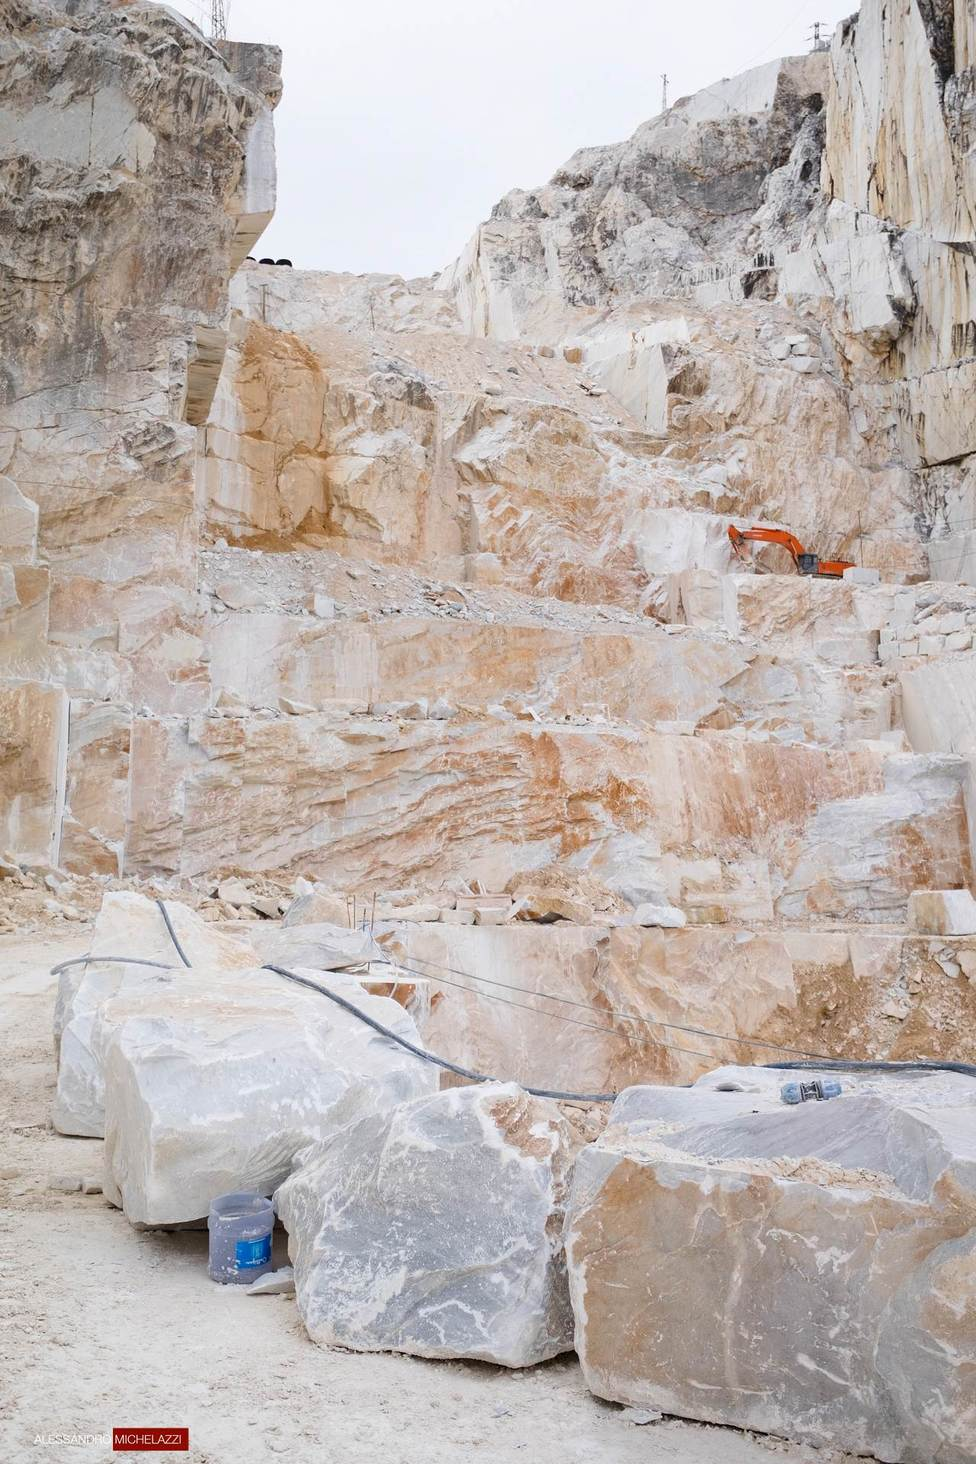 carrara-marble-cave-photos-11